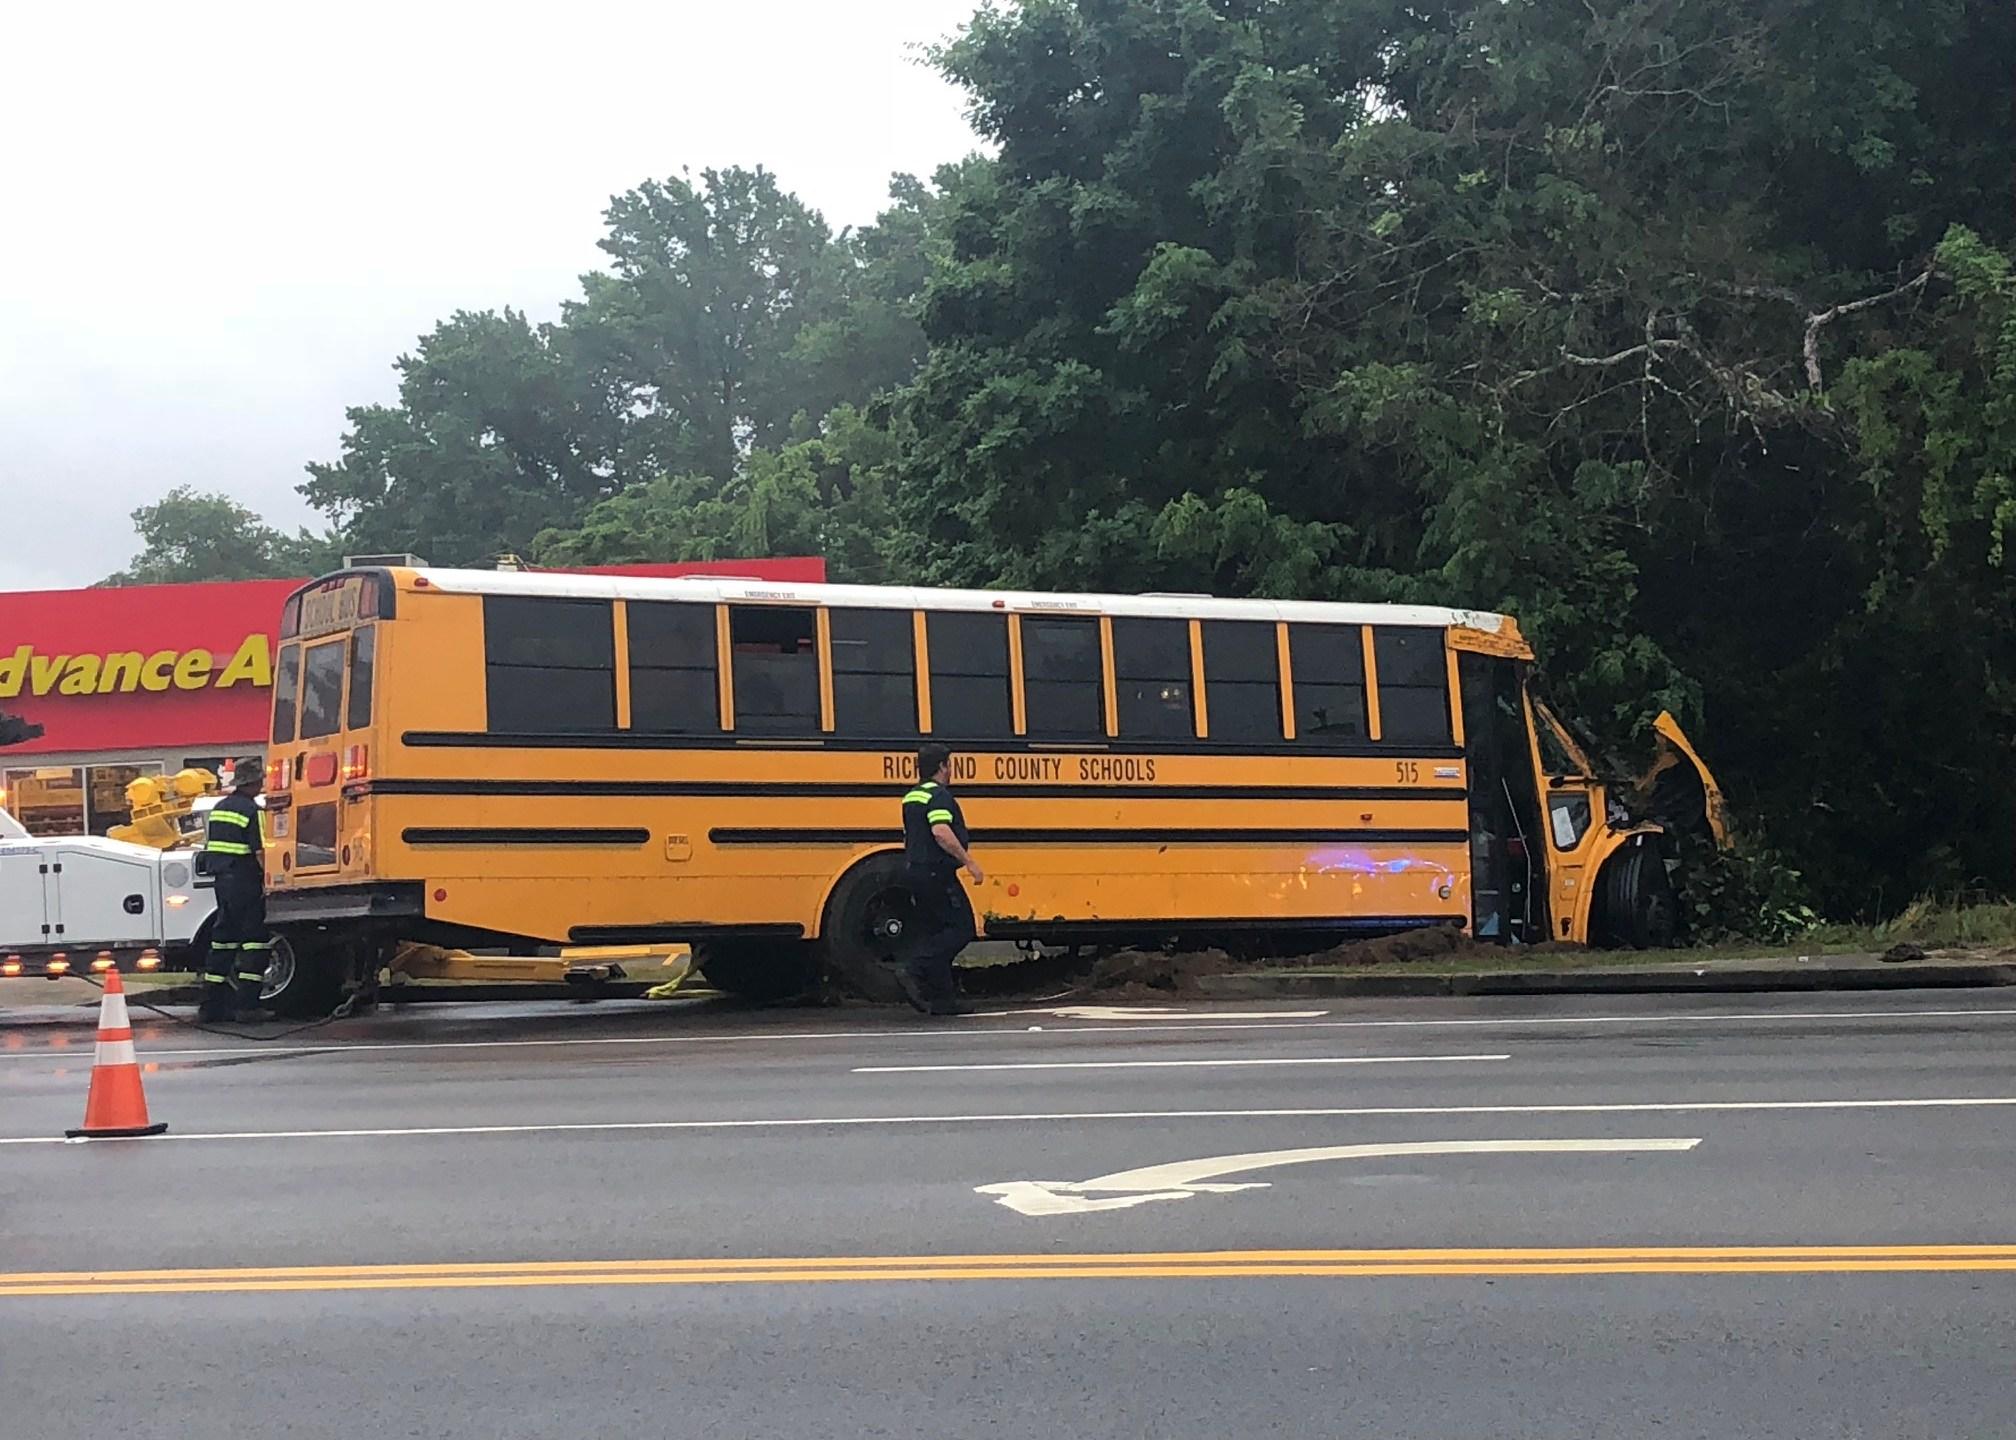 school bus overtuned photo of bus_1526470073627.jpeg.jpg